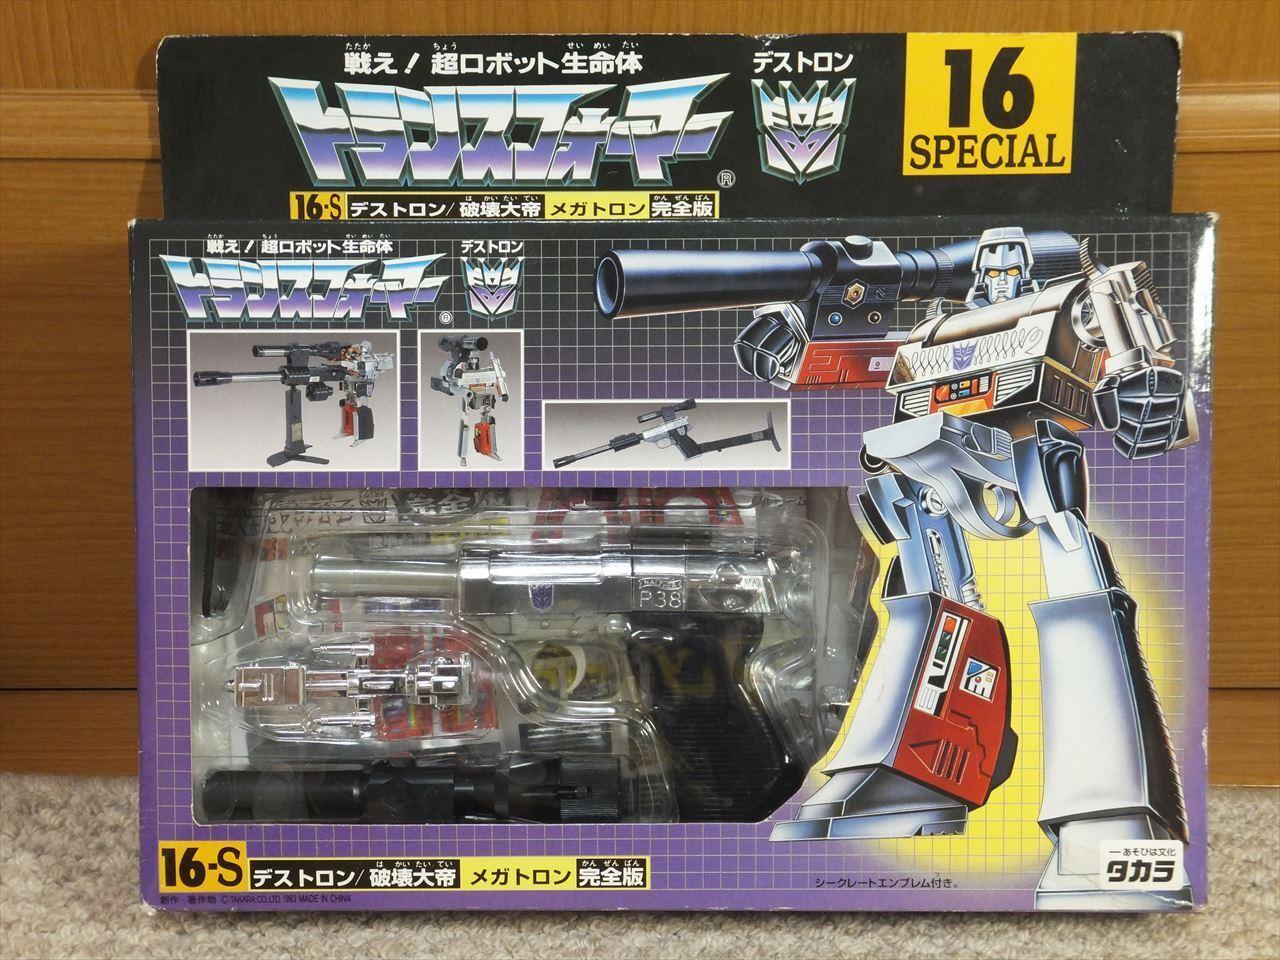 Transformers G1 DESTRON MEGATRON 16-S Special TAKARA